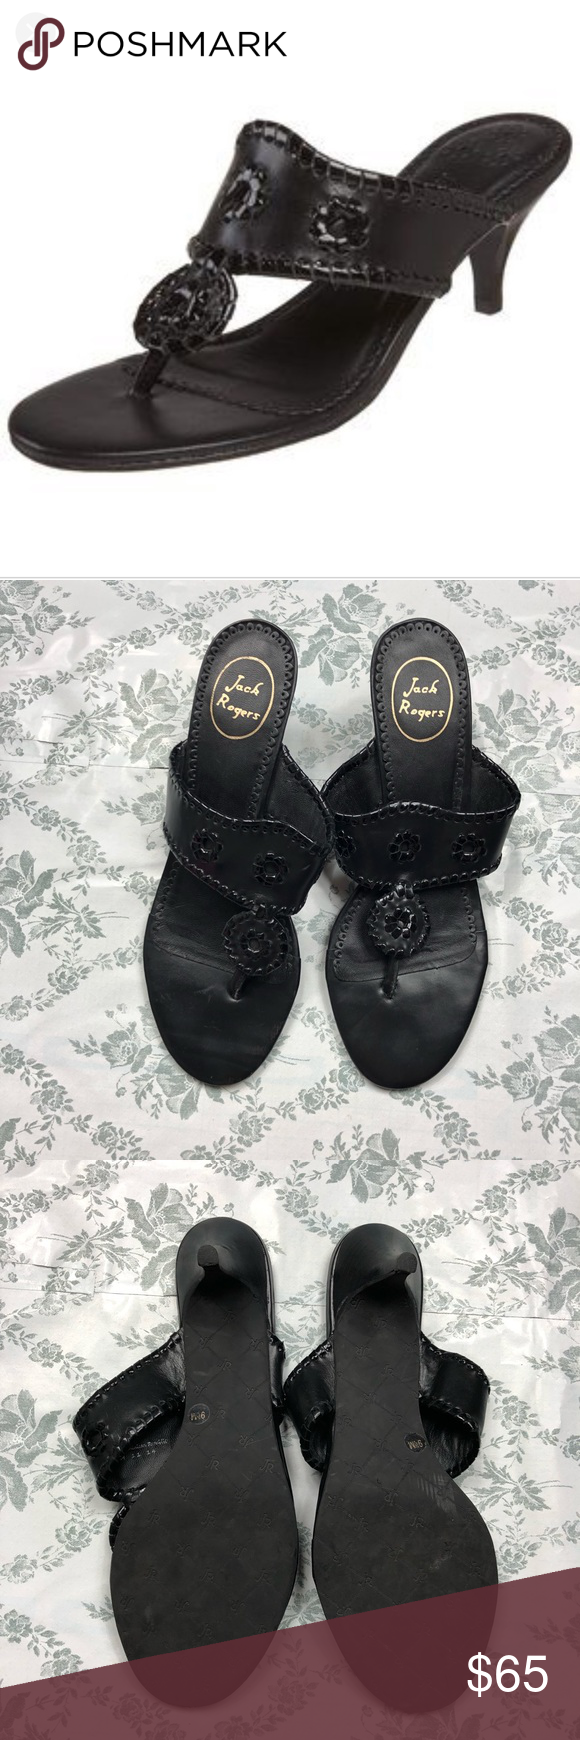 Jack Rogers Kitten Heel Maggie Black Sz 9 5 Kitten Heels Jack Rogers Shoes Black